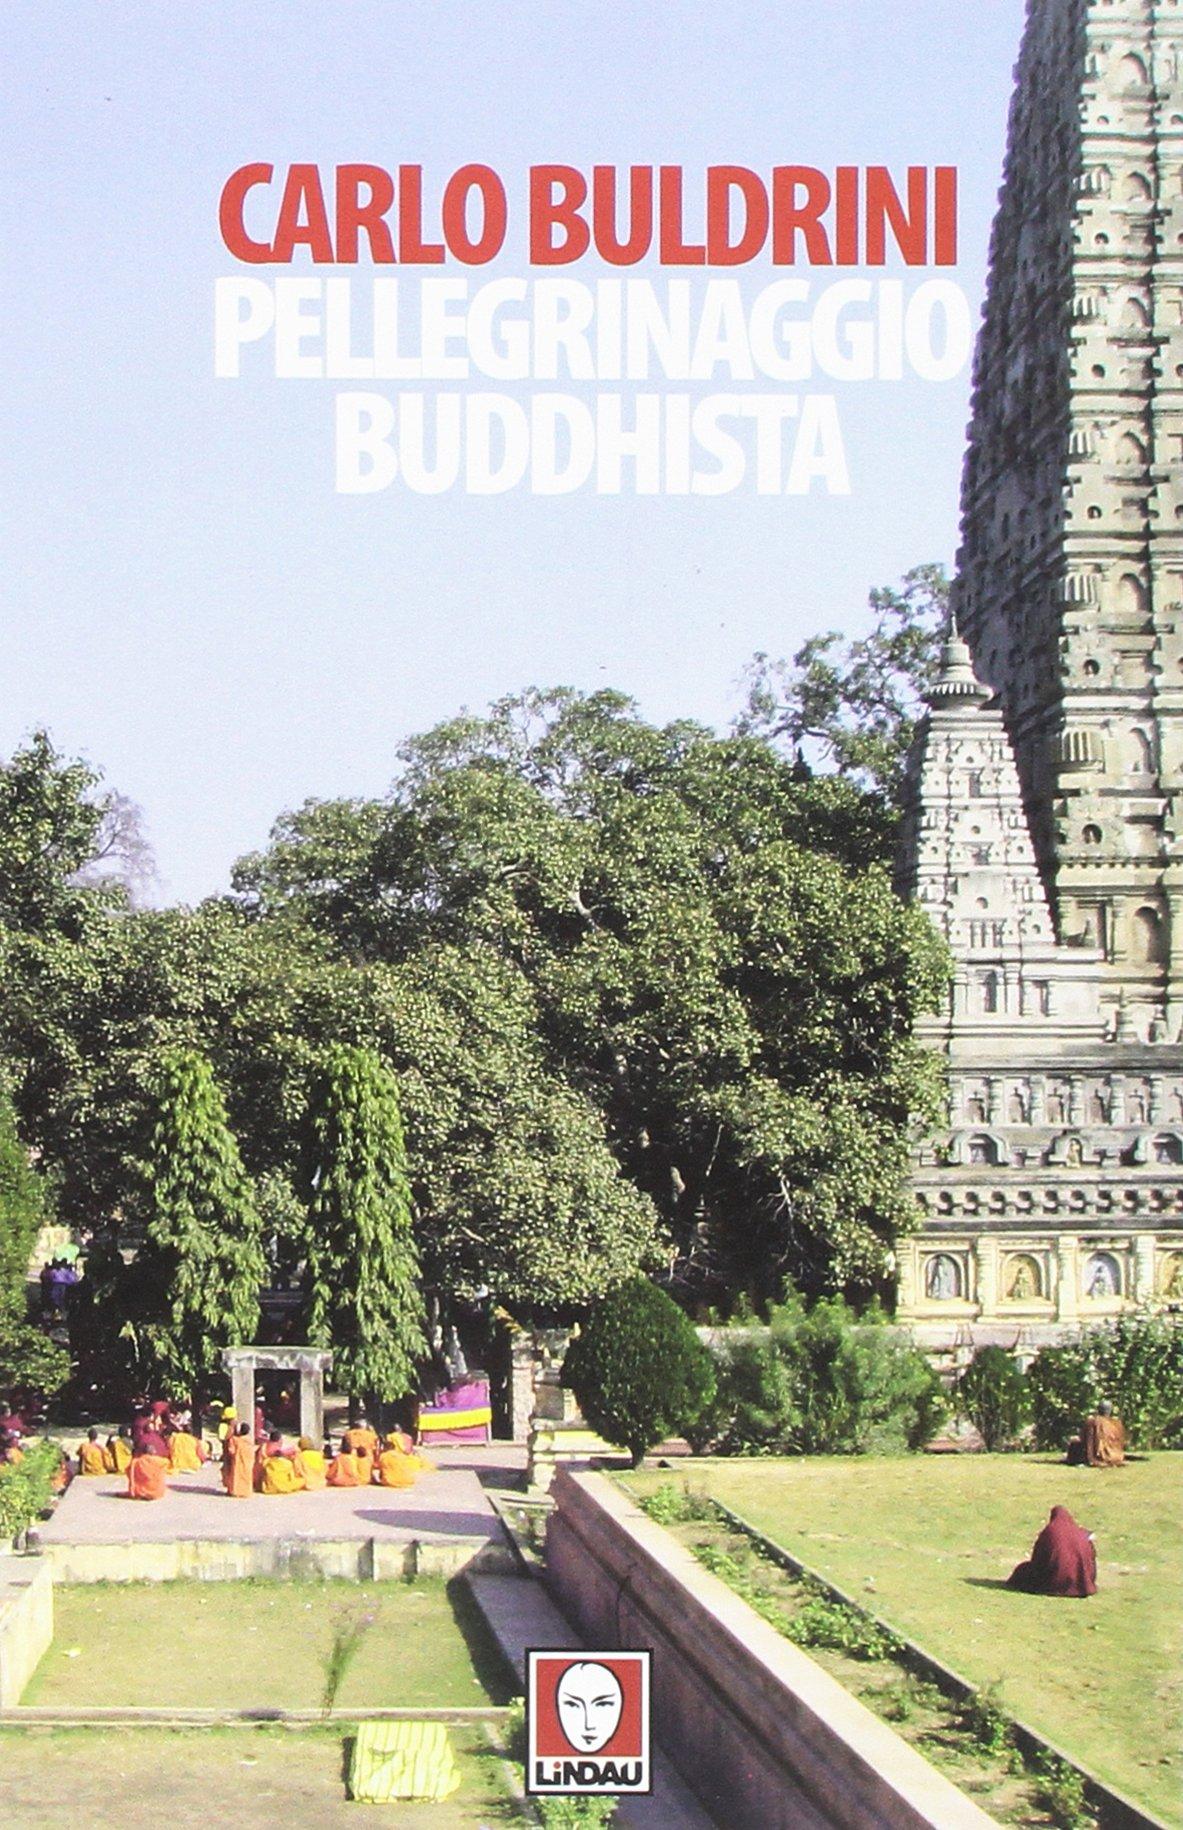 Pellegrinaggio buddhista. Sulle orme di Siddhartha Copertina flessibile – 11 feb 2016 Carlo Buldrini Lindau 8867084496 Buddismo